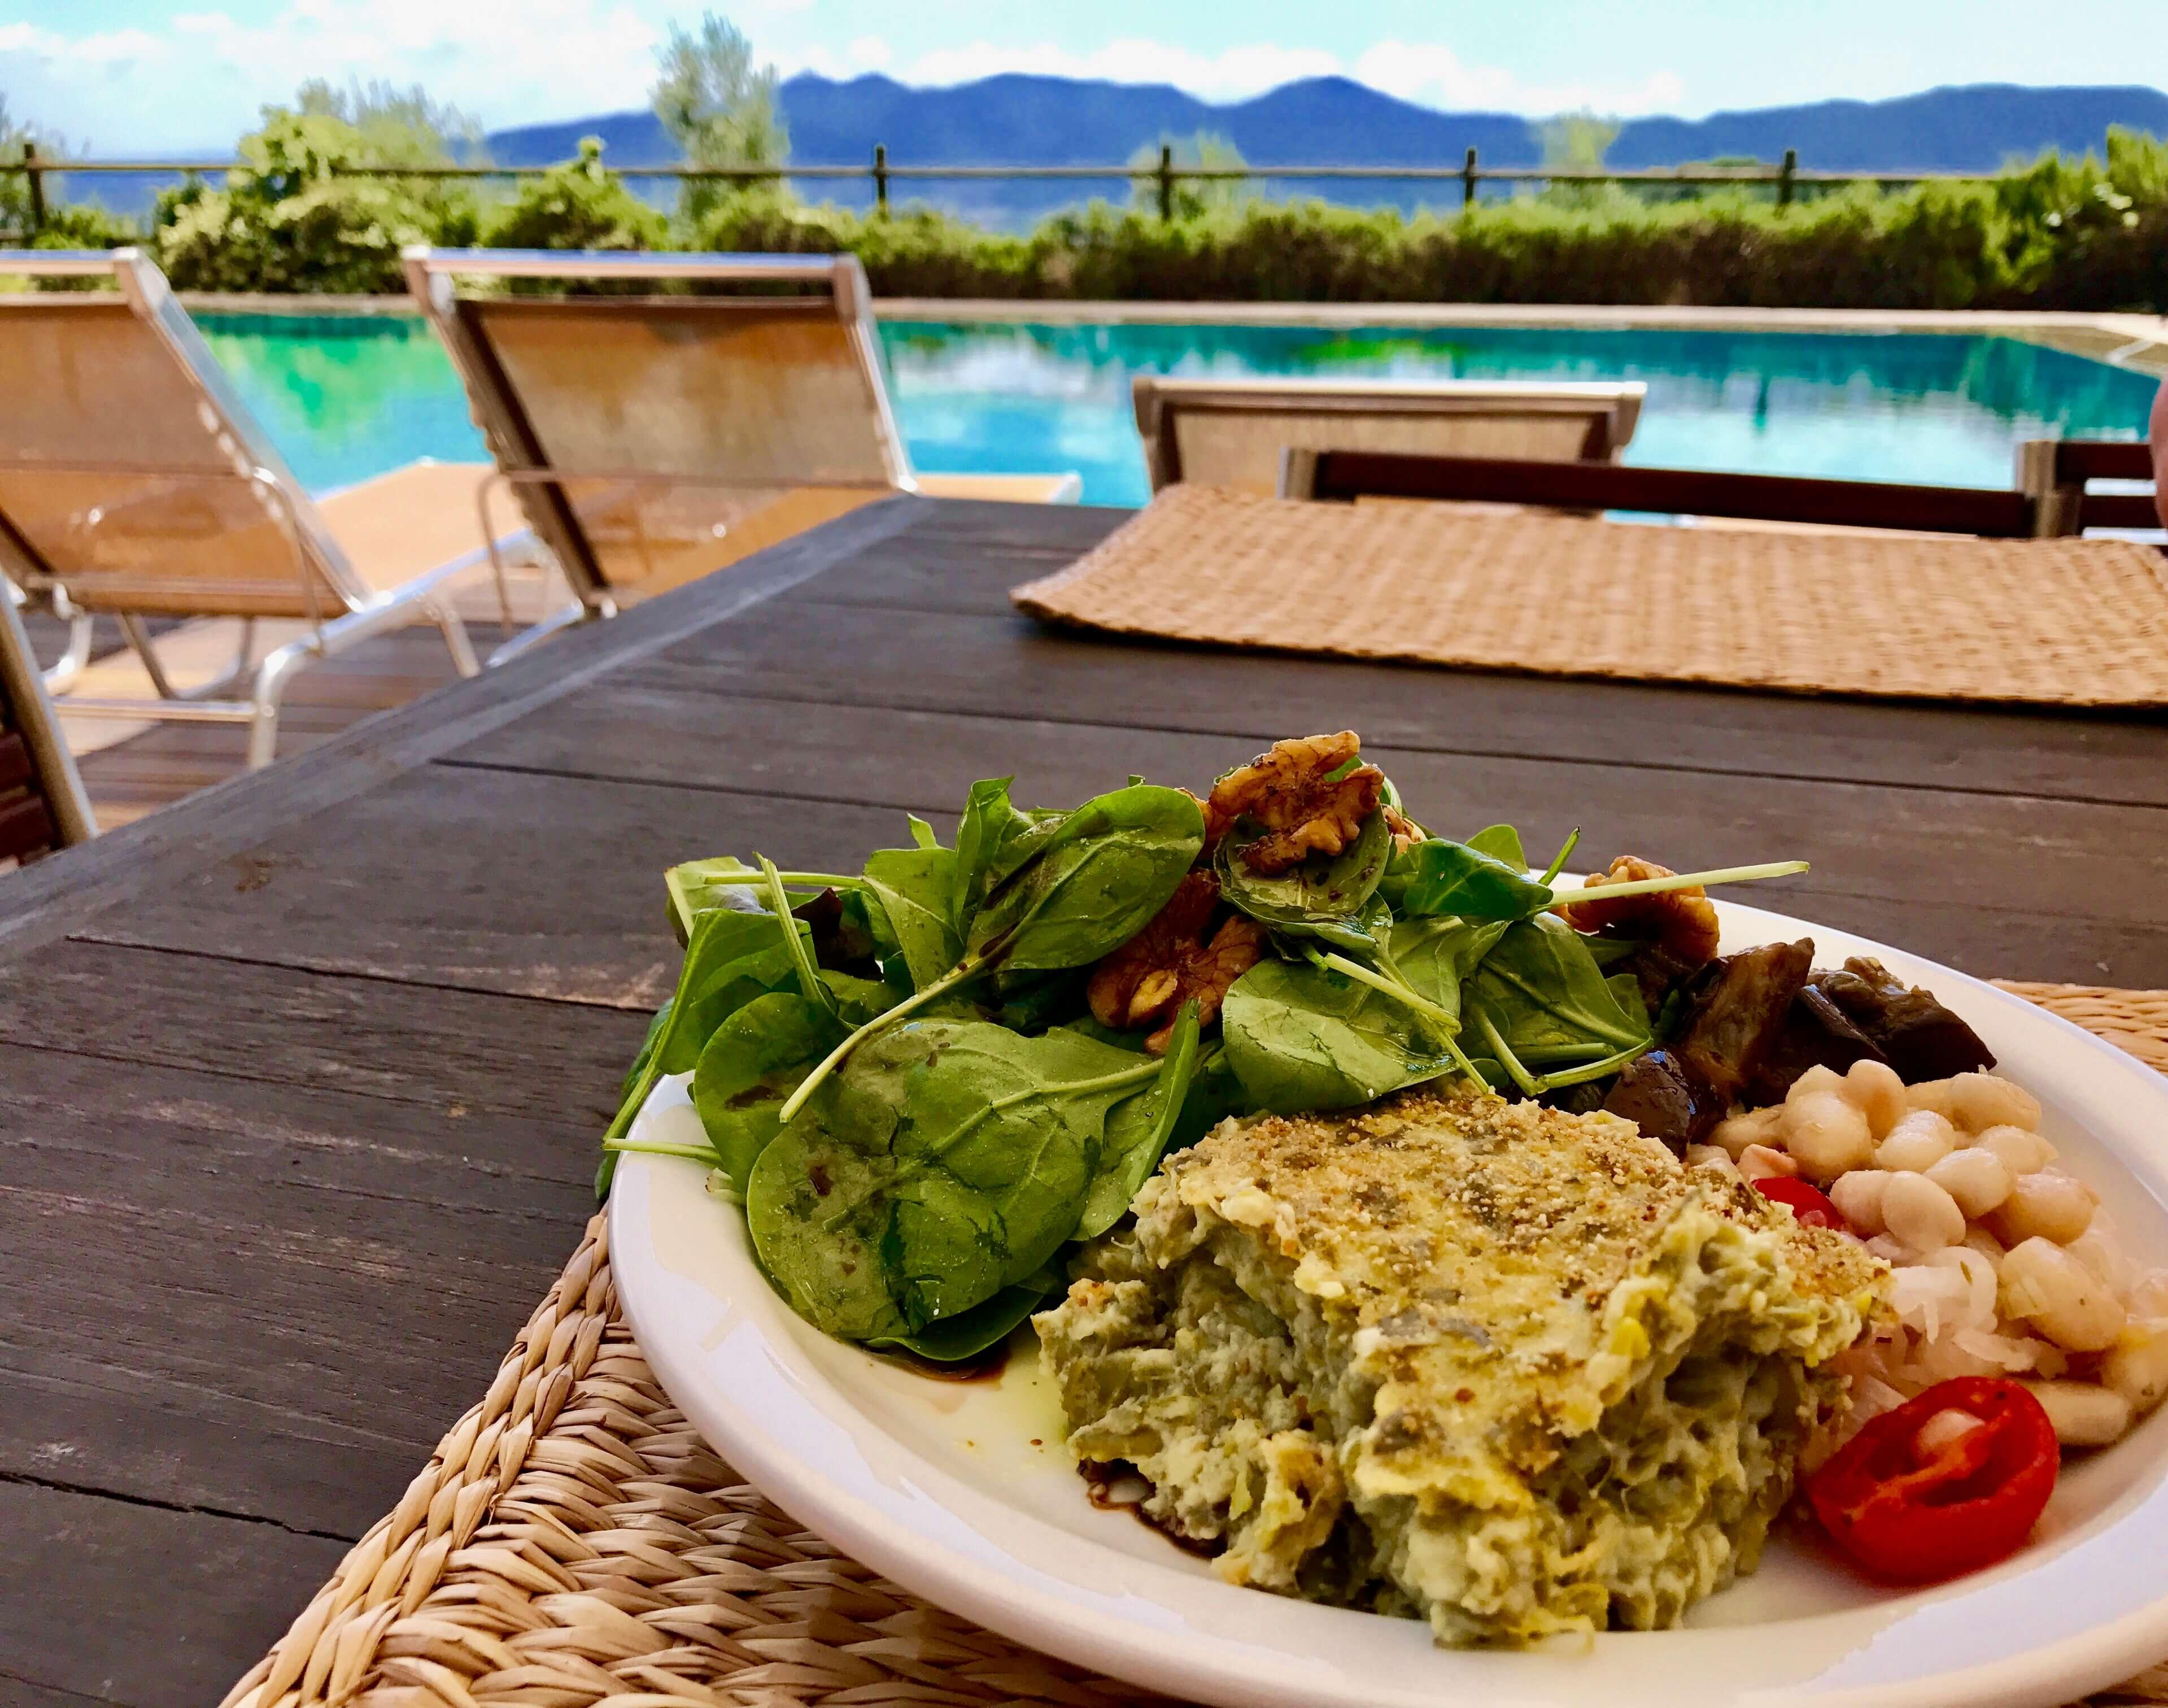 Food - Sformato with Cannelini bean salad